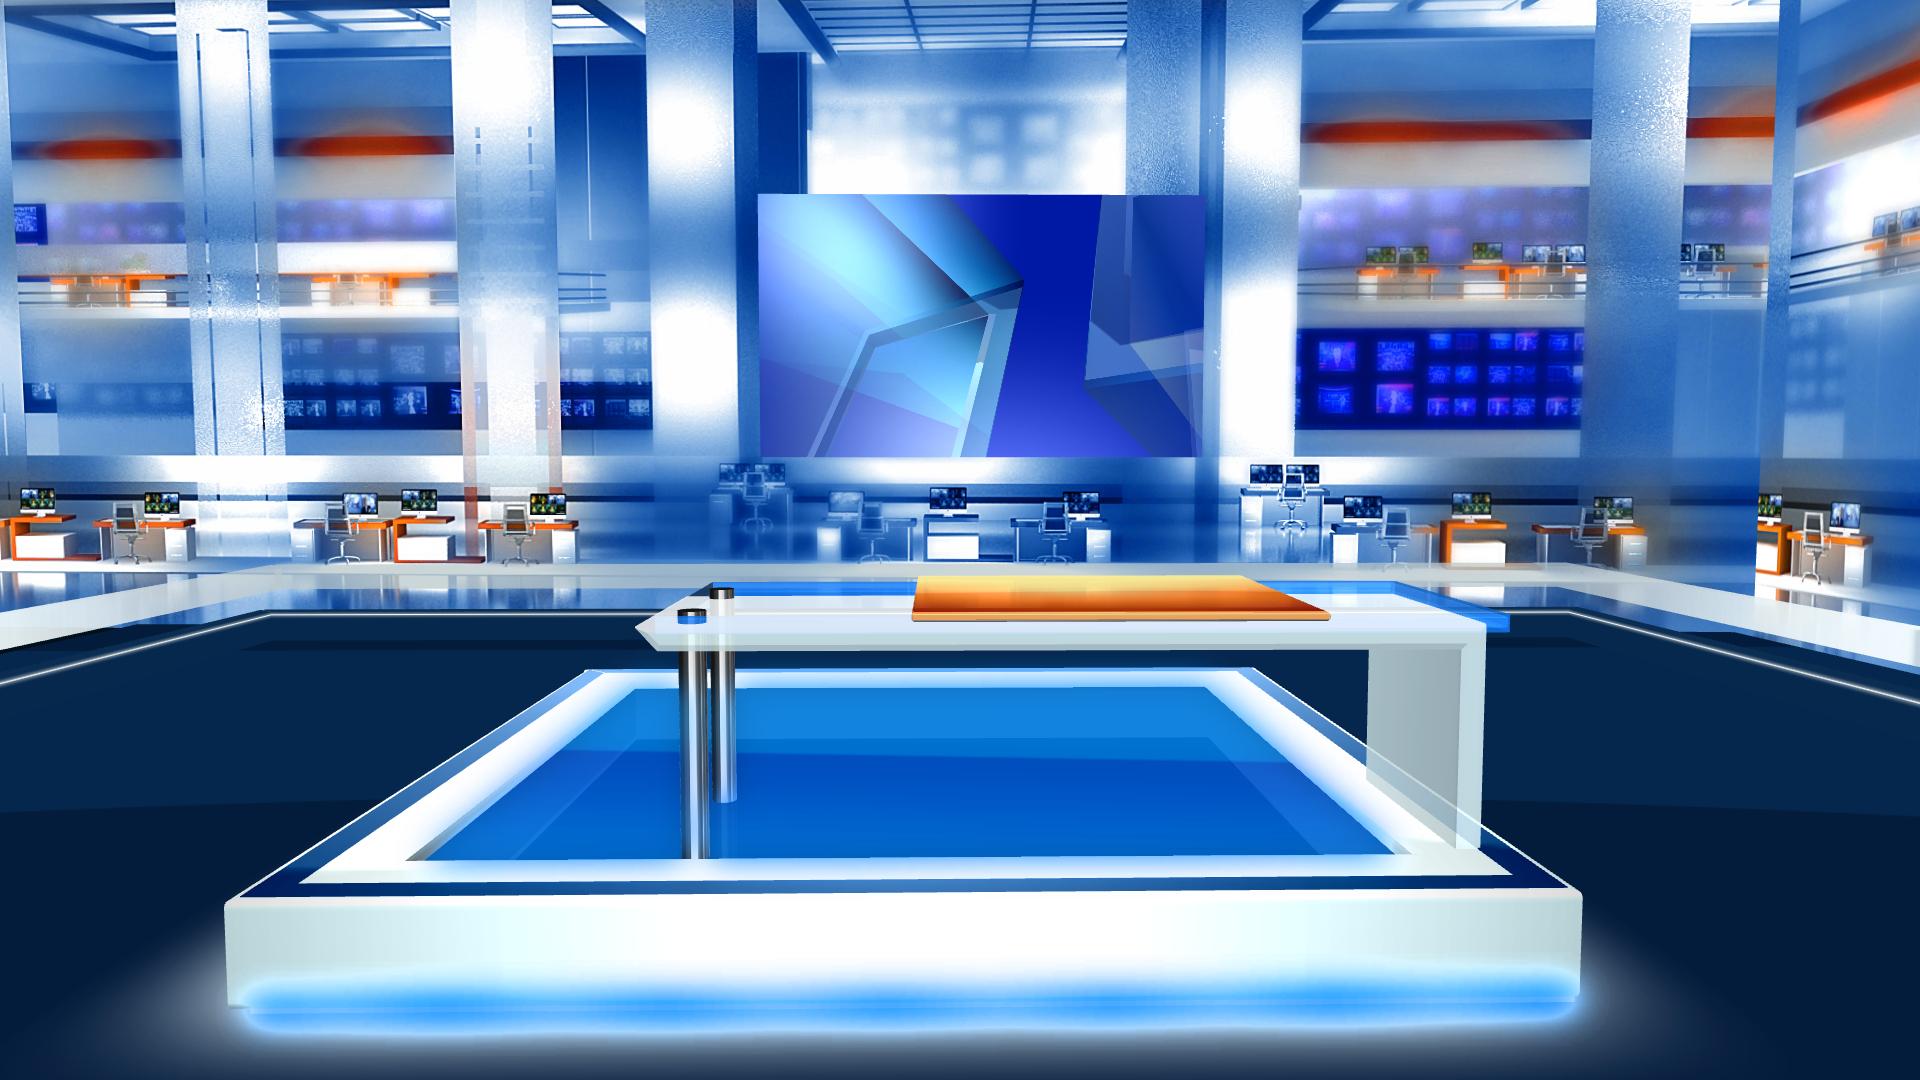 Tv Studio Background Free Download Virtual Studio In Blue Free Virtualset virtual studio in blue free virtualset